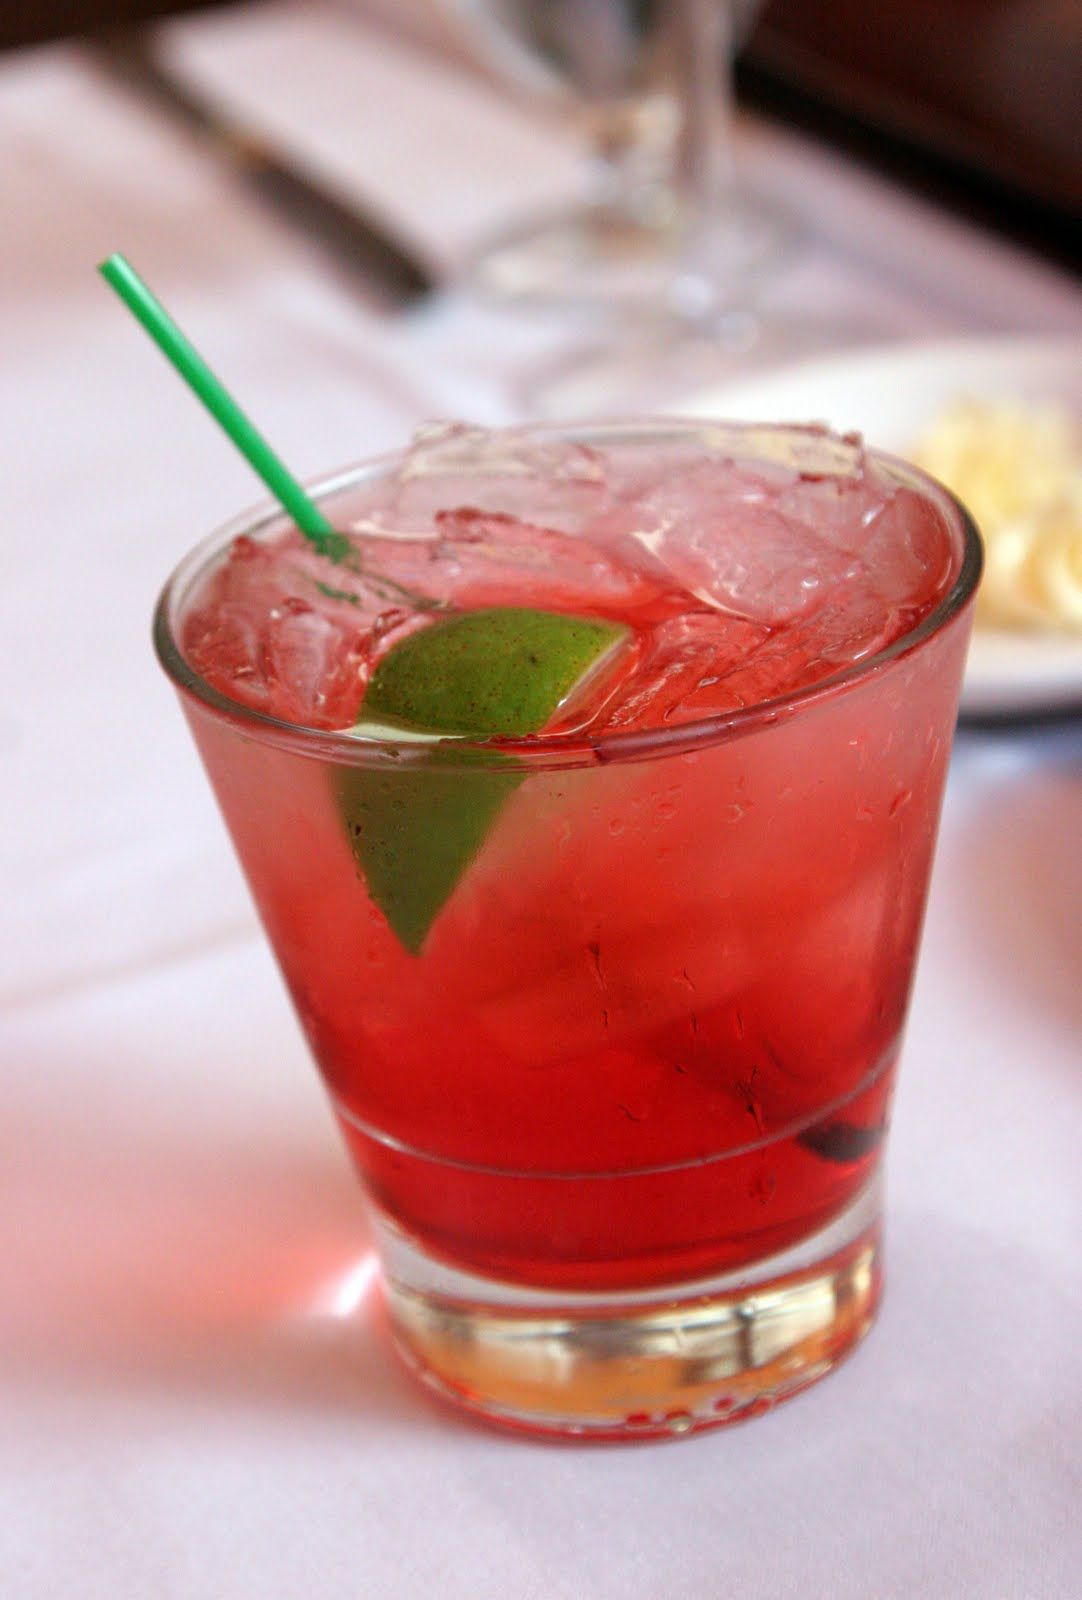 Cranberry Vodka Drinks  Fist Pump 1oz SKYY Pineapple 2oz 7 UP 1oz Cranberry Juice